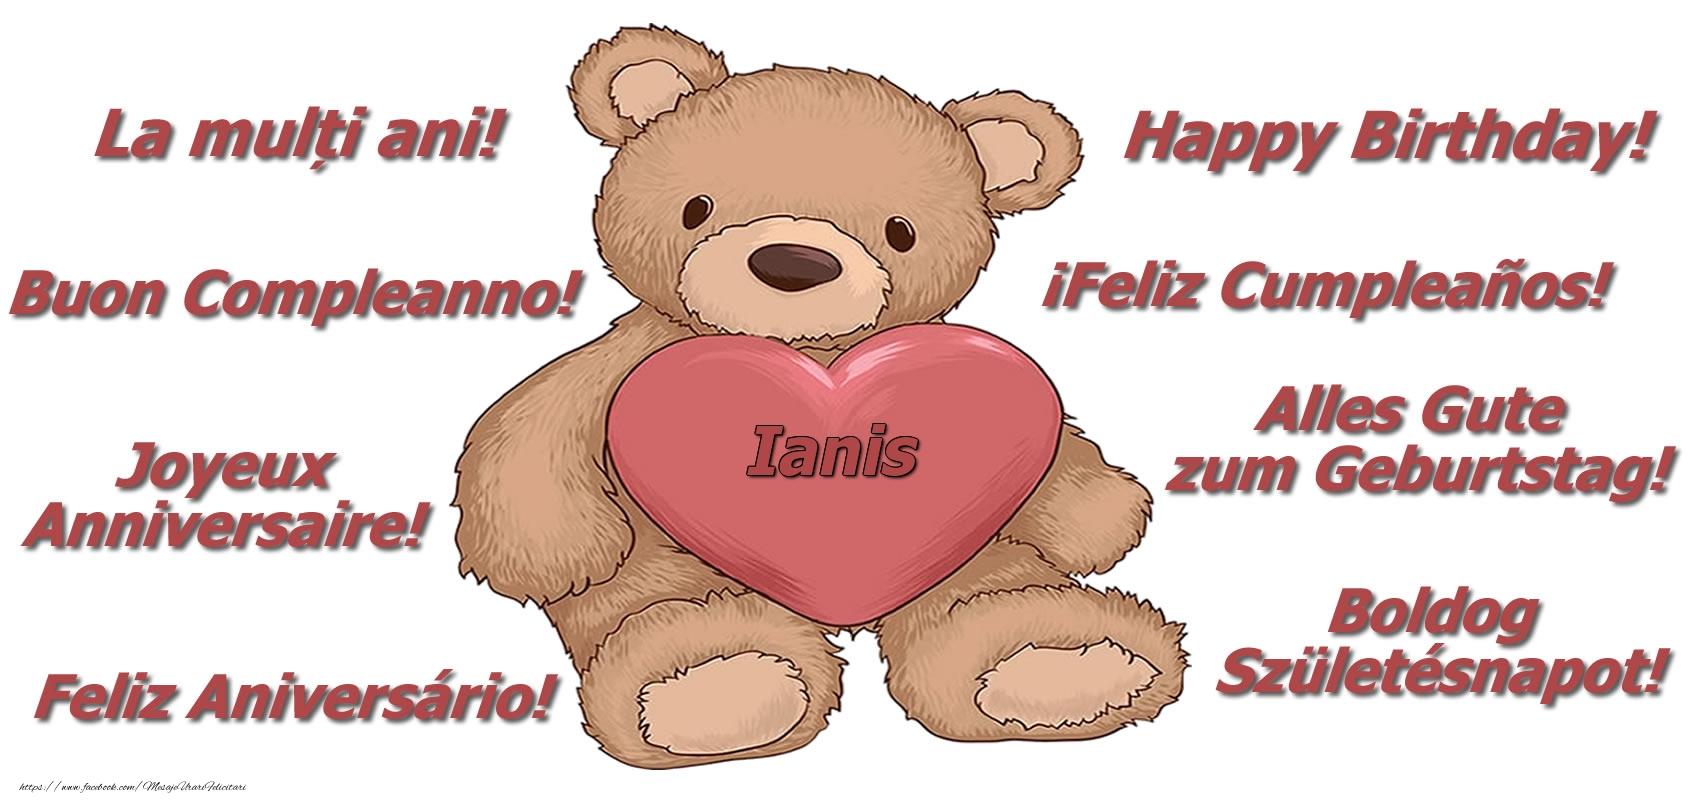 Felicitari de zi de nastere - La multi ani Ianis! - Ursulet